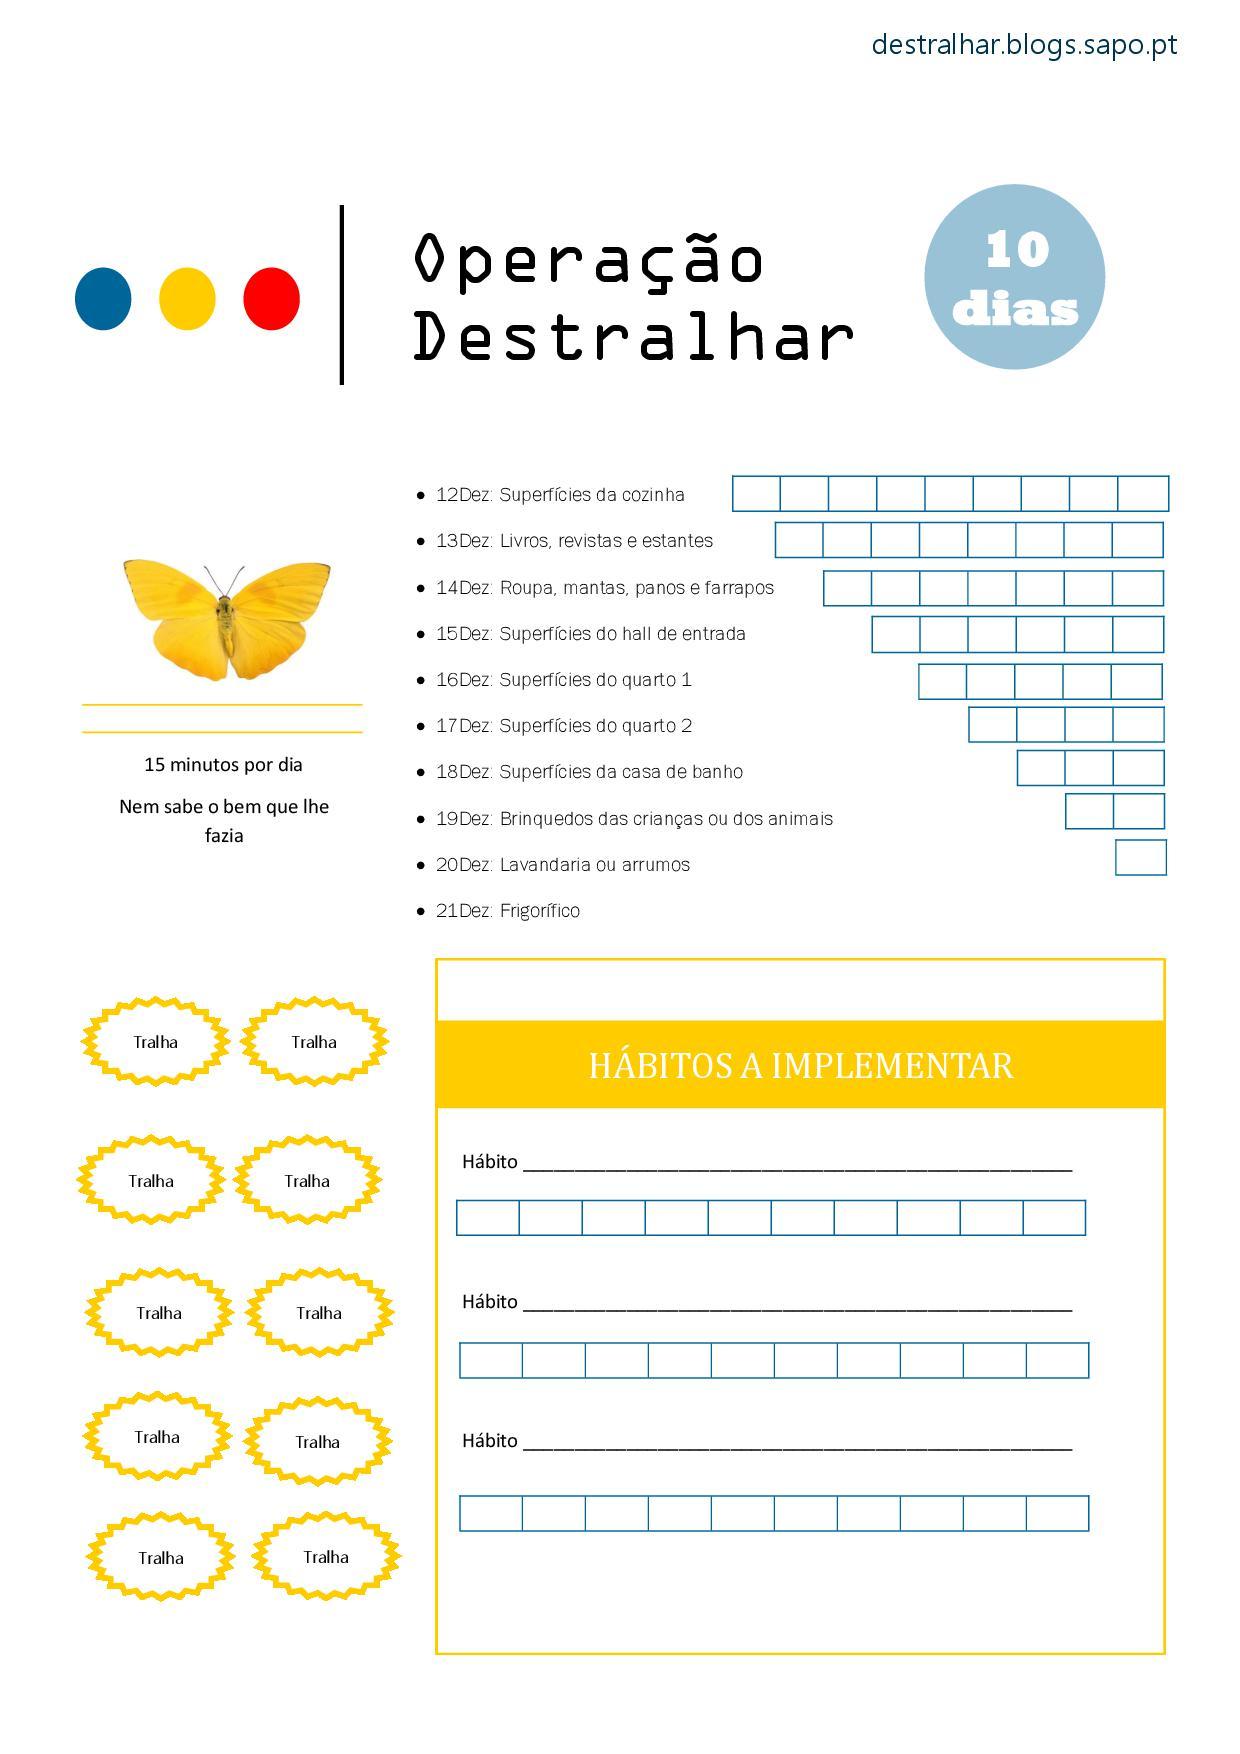 Destralhar-001.jpg